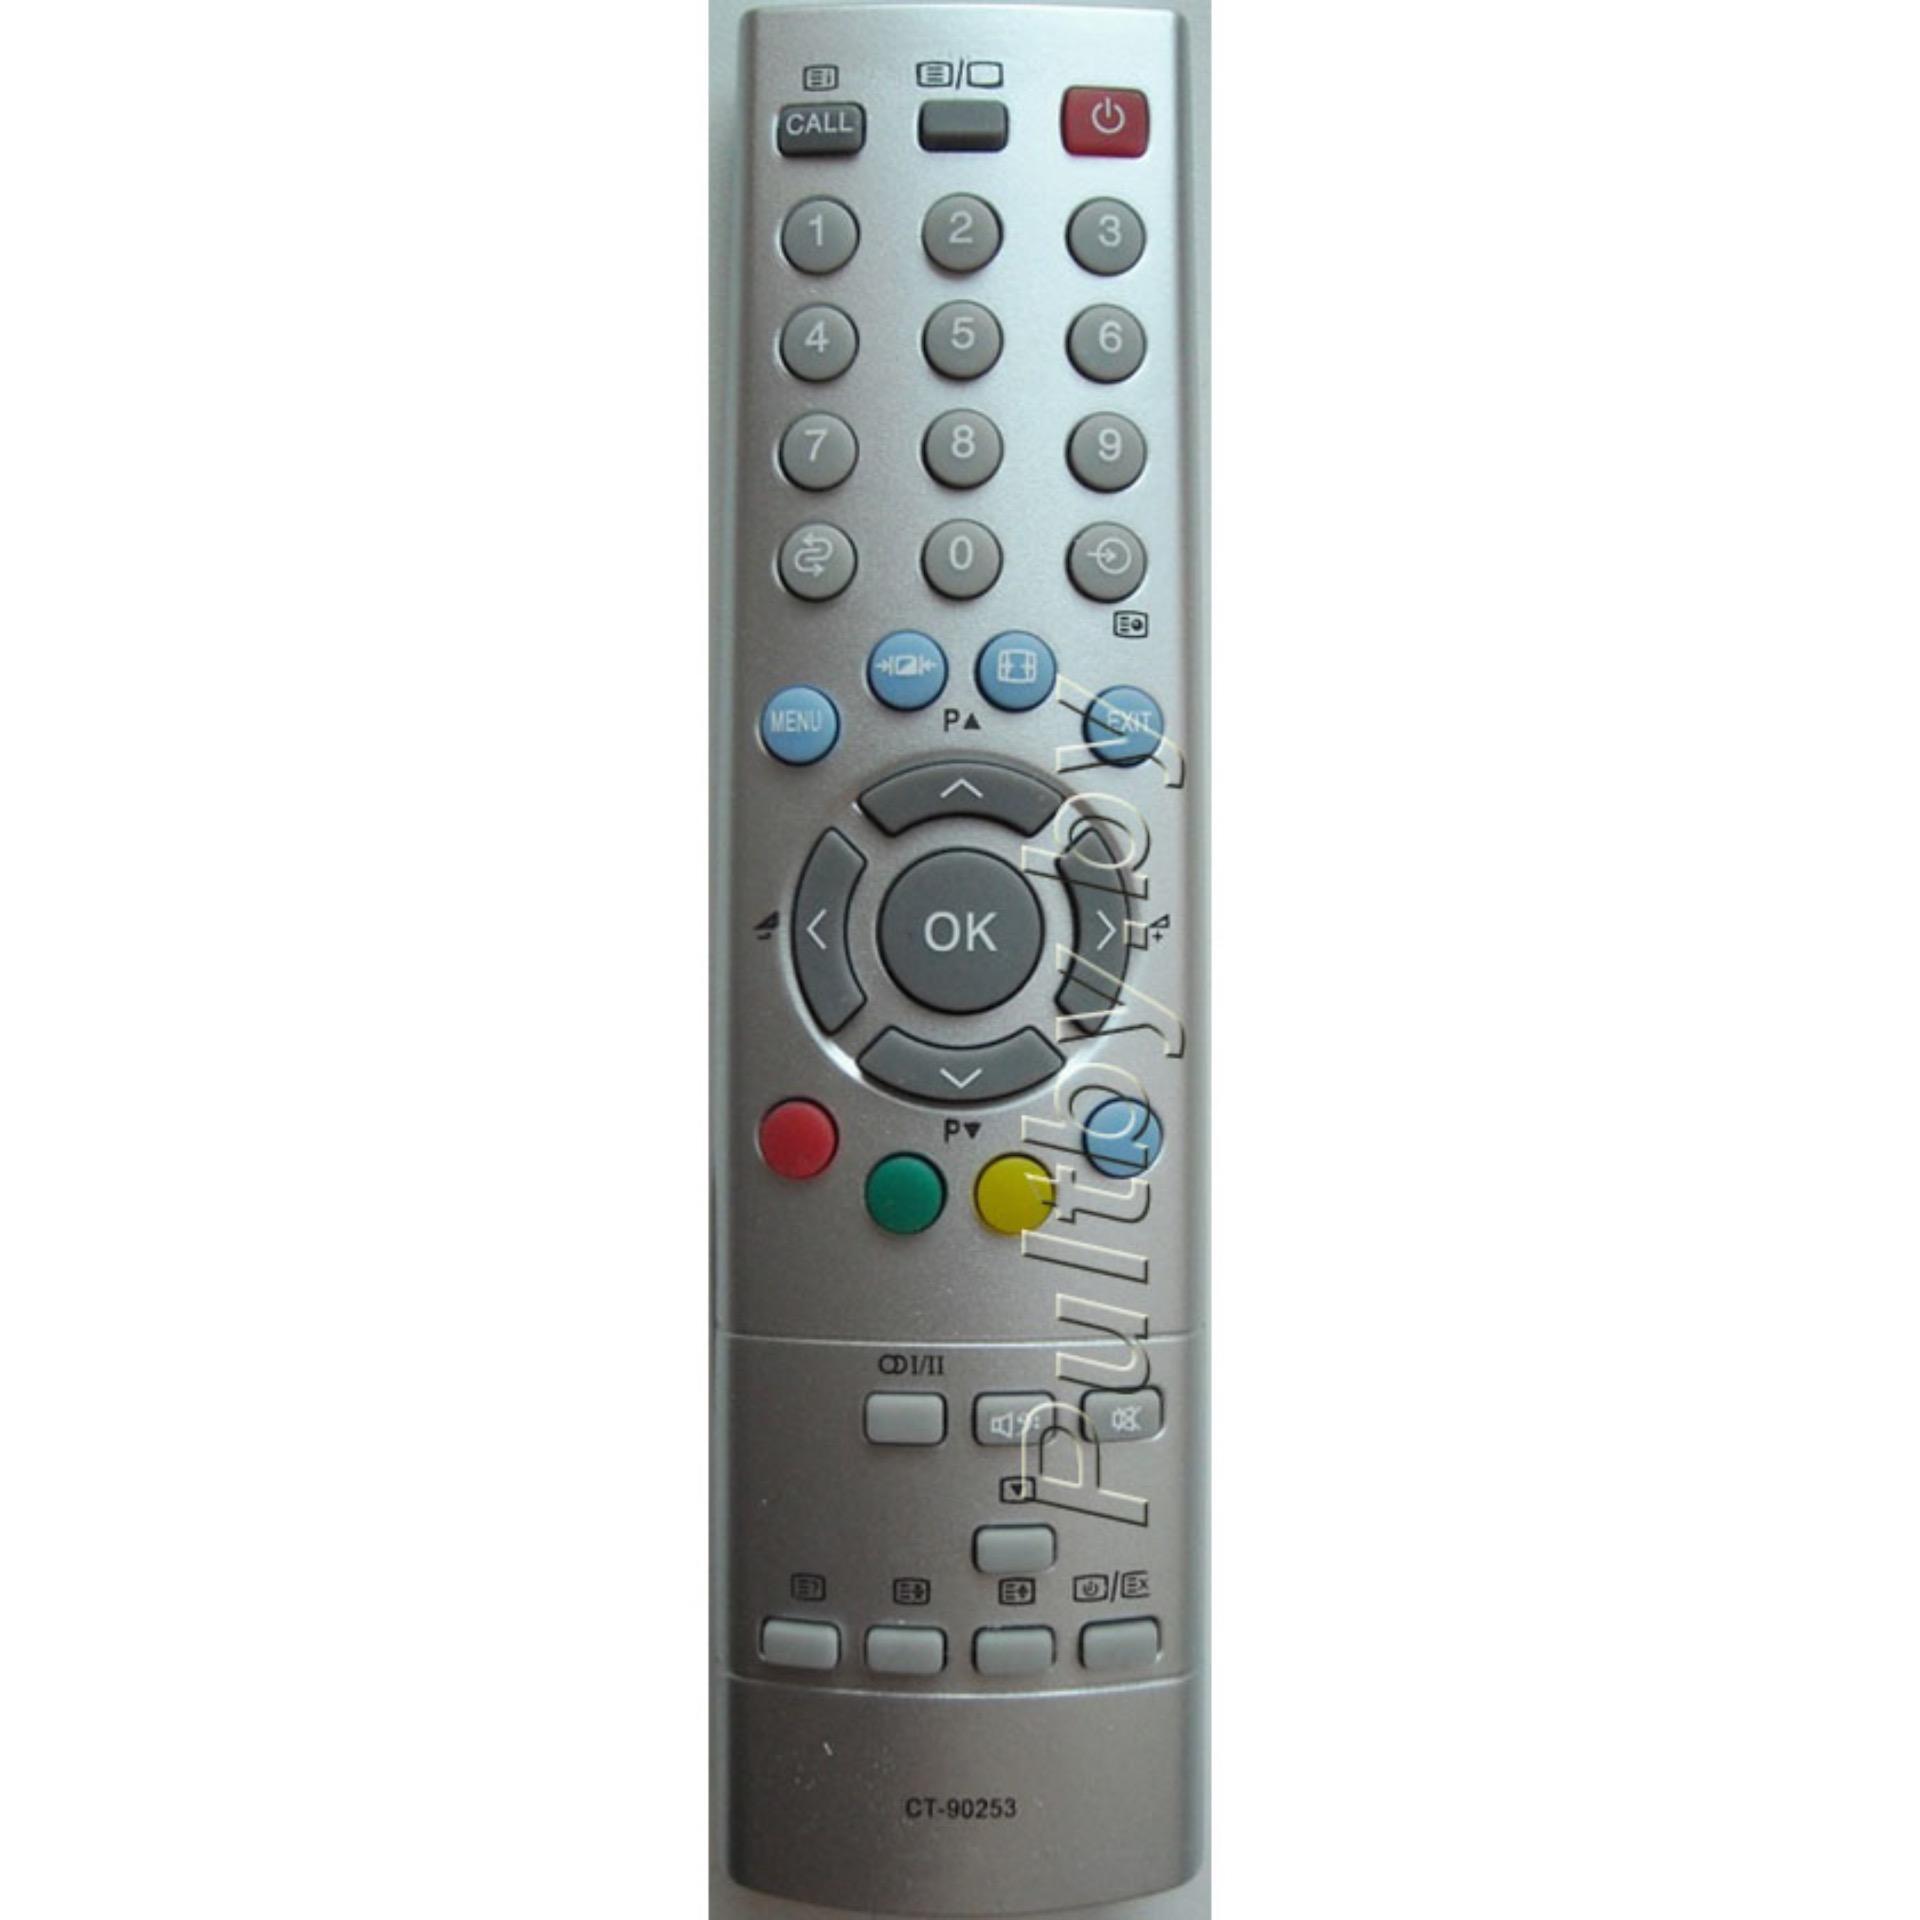 Toshiba Remote TV LCD / Projection CT 90253 - Original